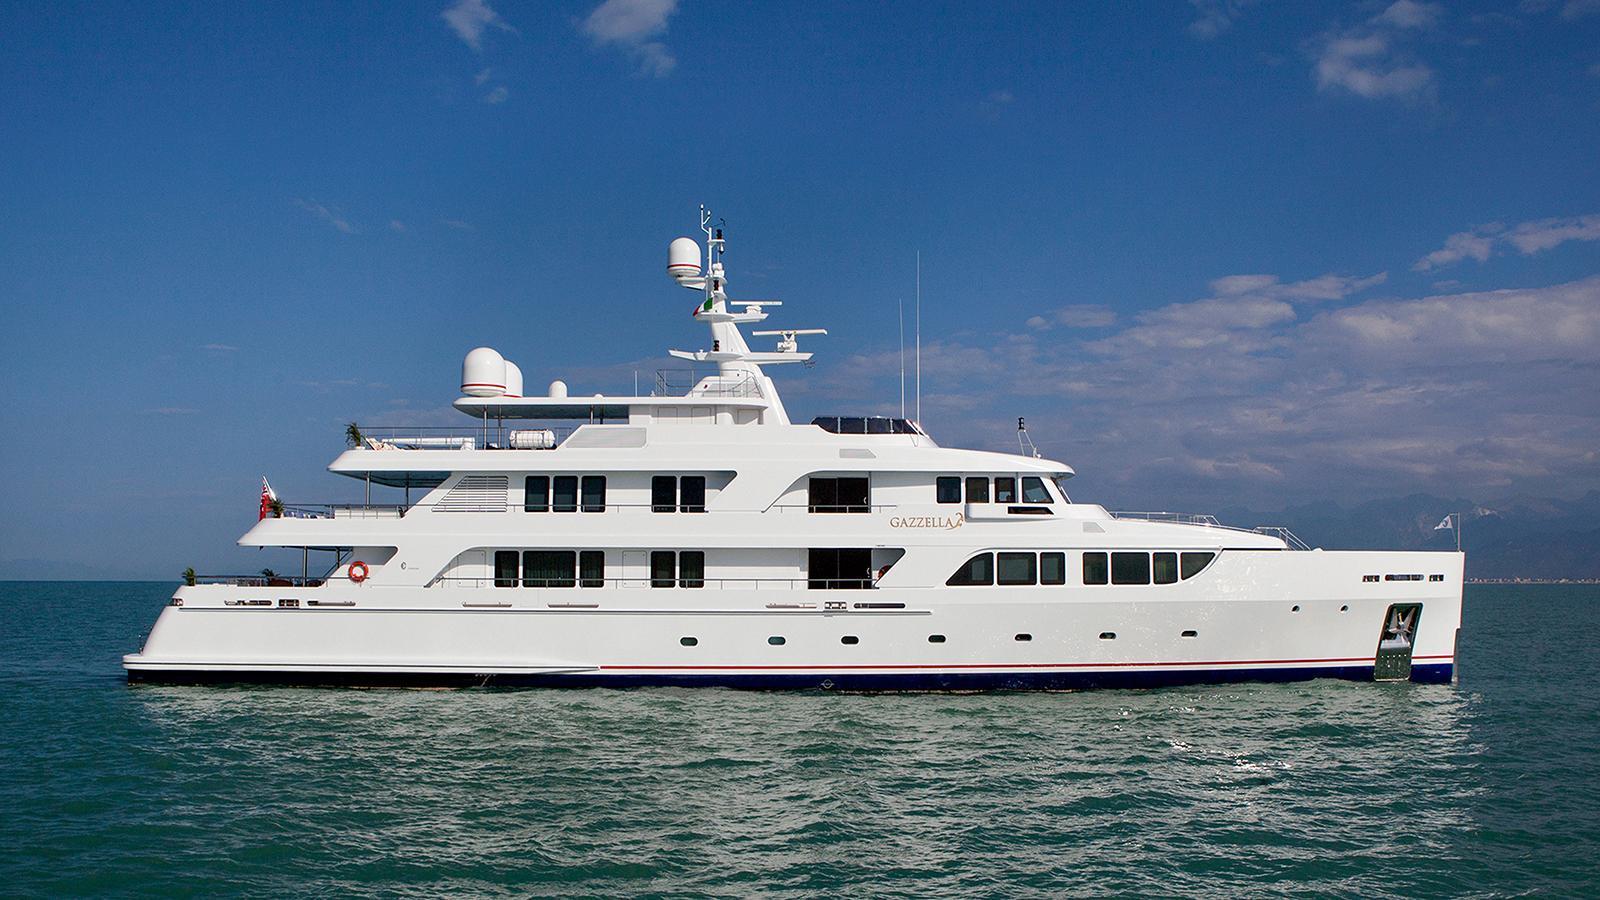 gazzella-motor-yacht-codecasa-2015-50m-profile